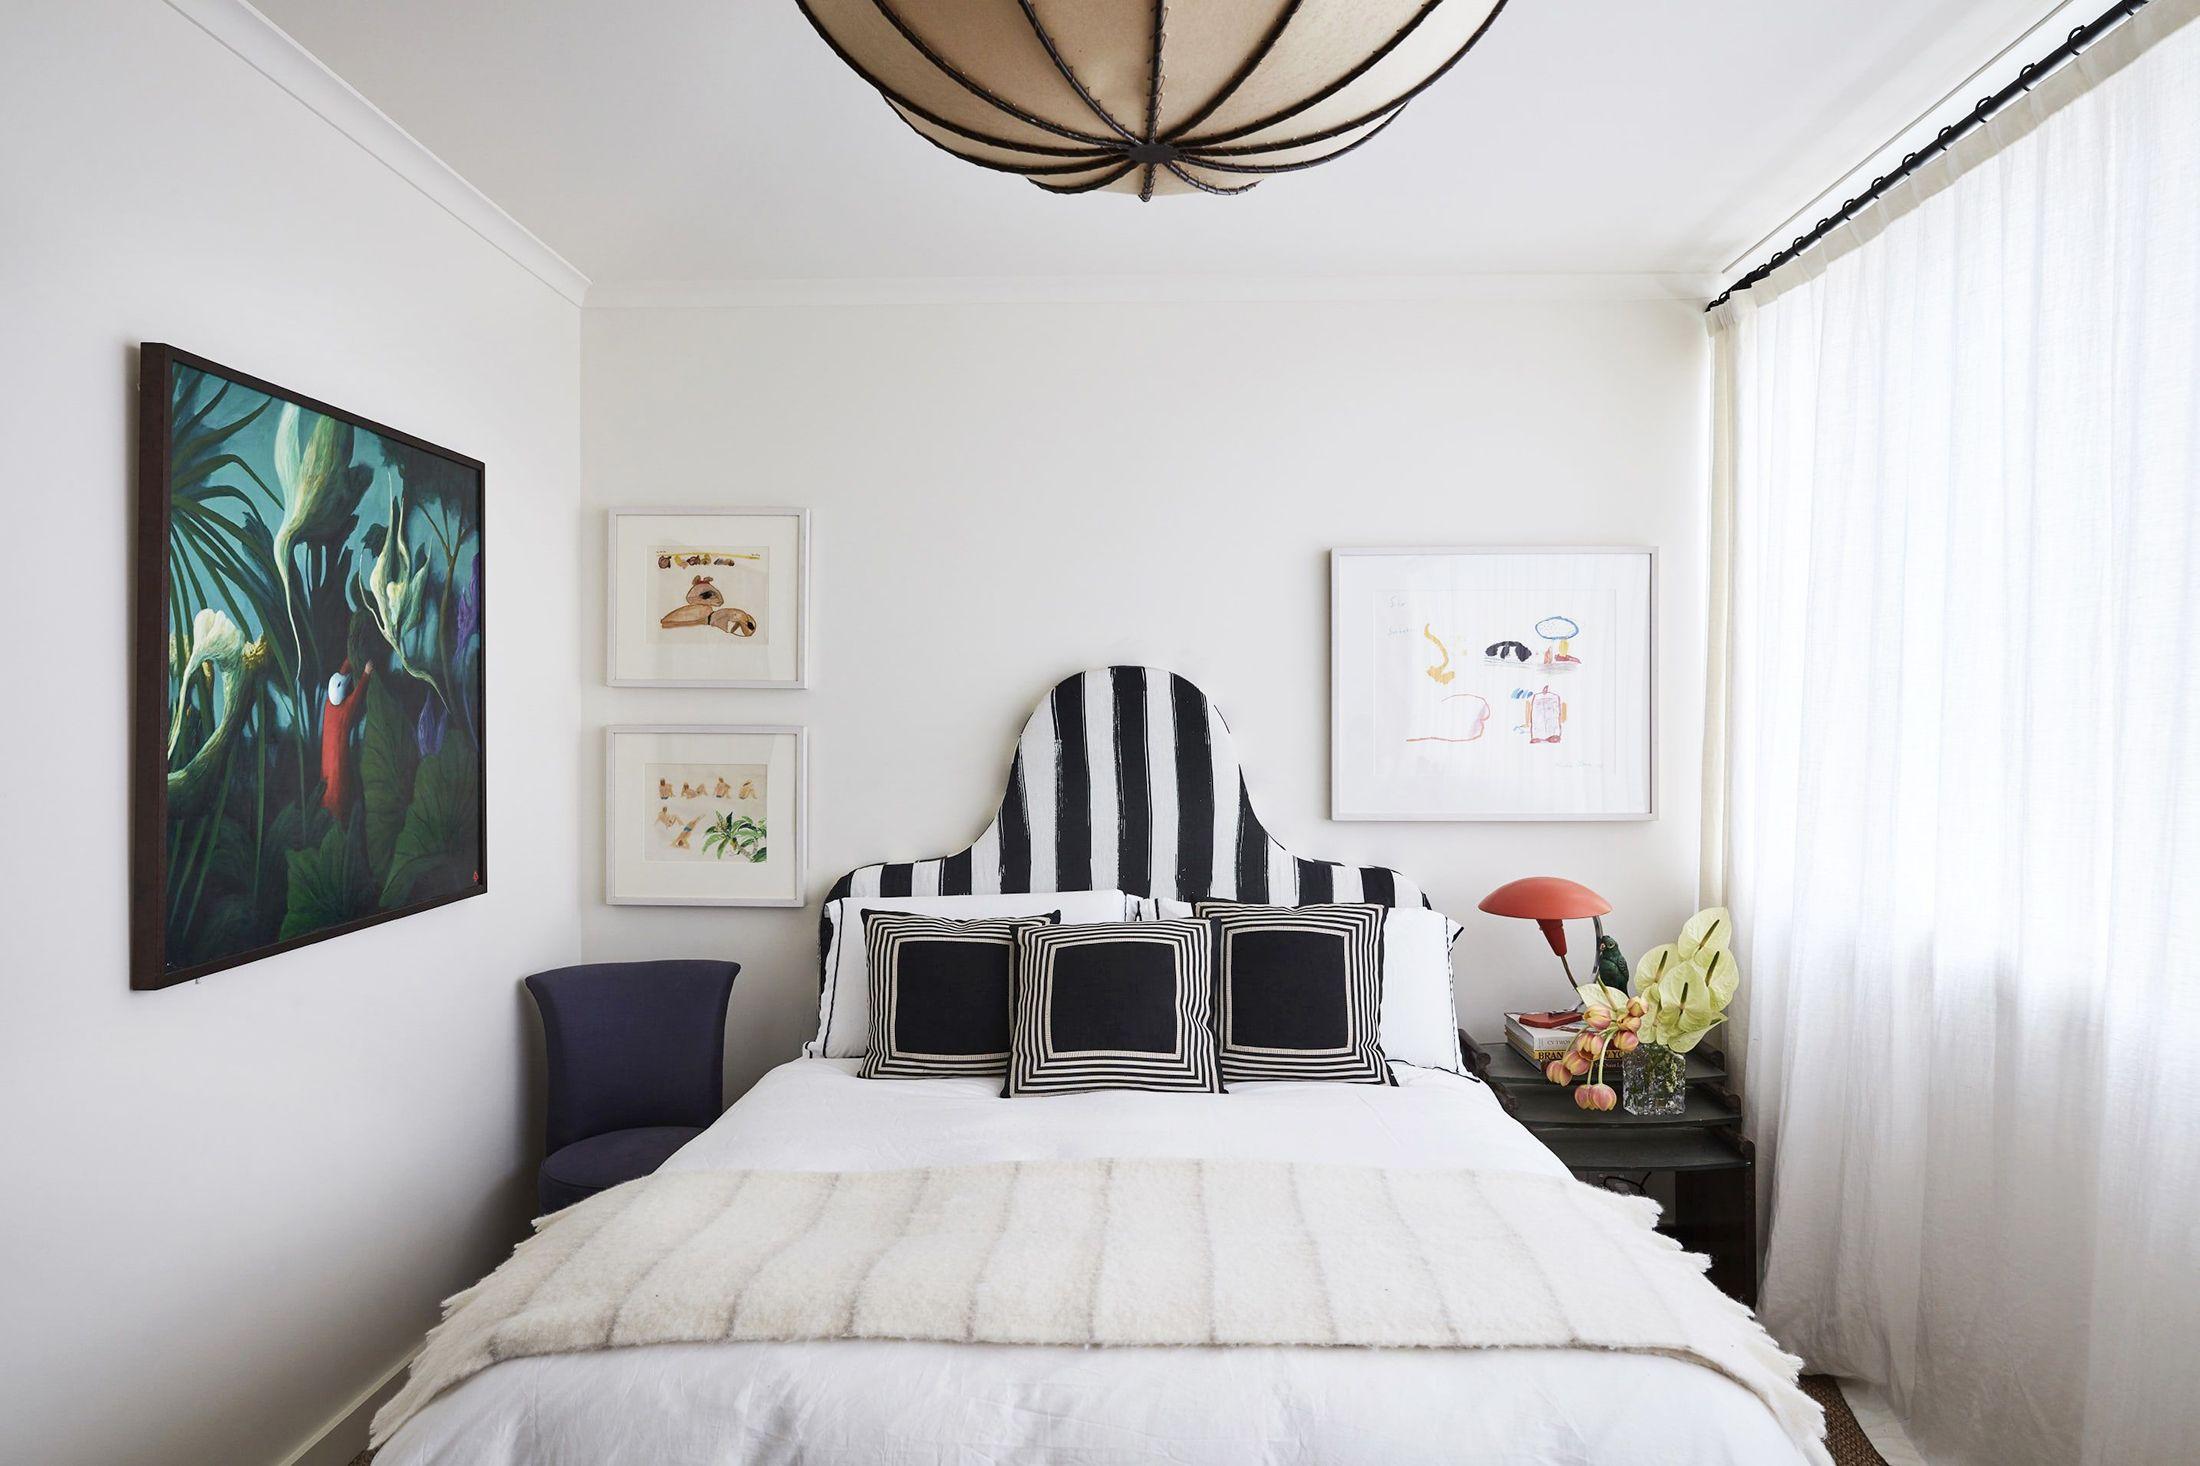 10 Best Bedroom Wall Decor Ideas in 10 - Bedroom Wall Decor